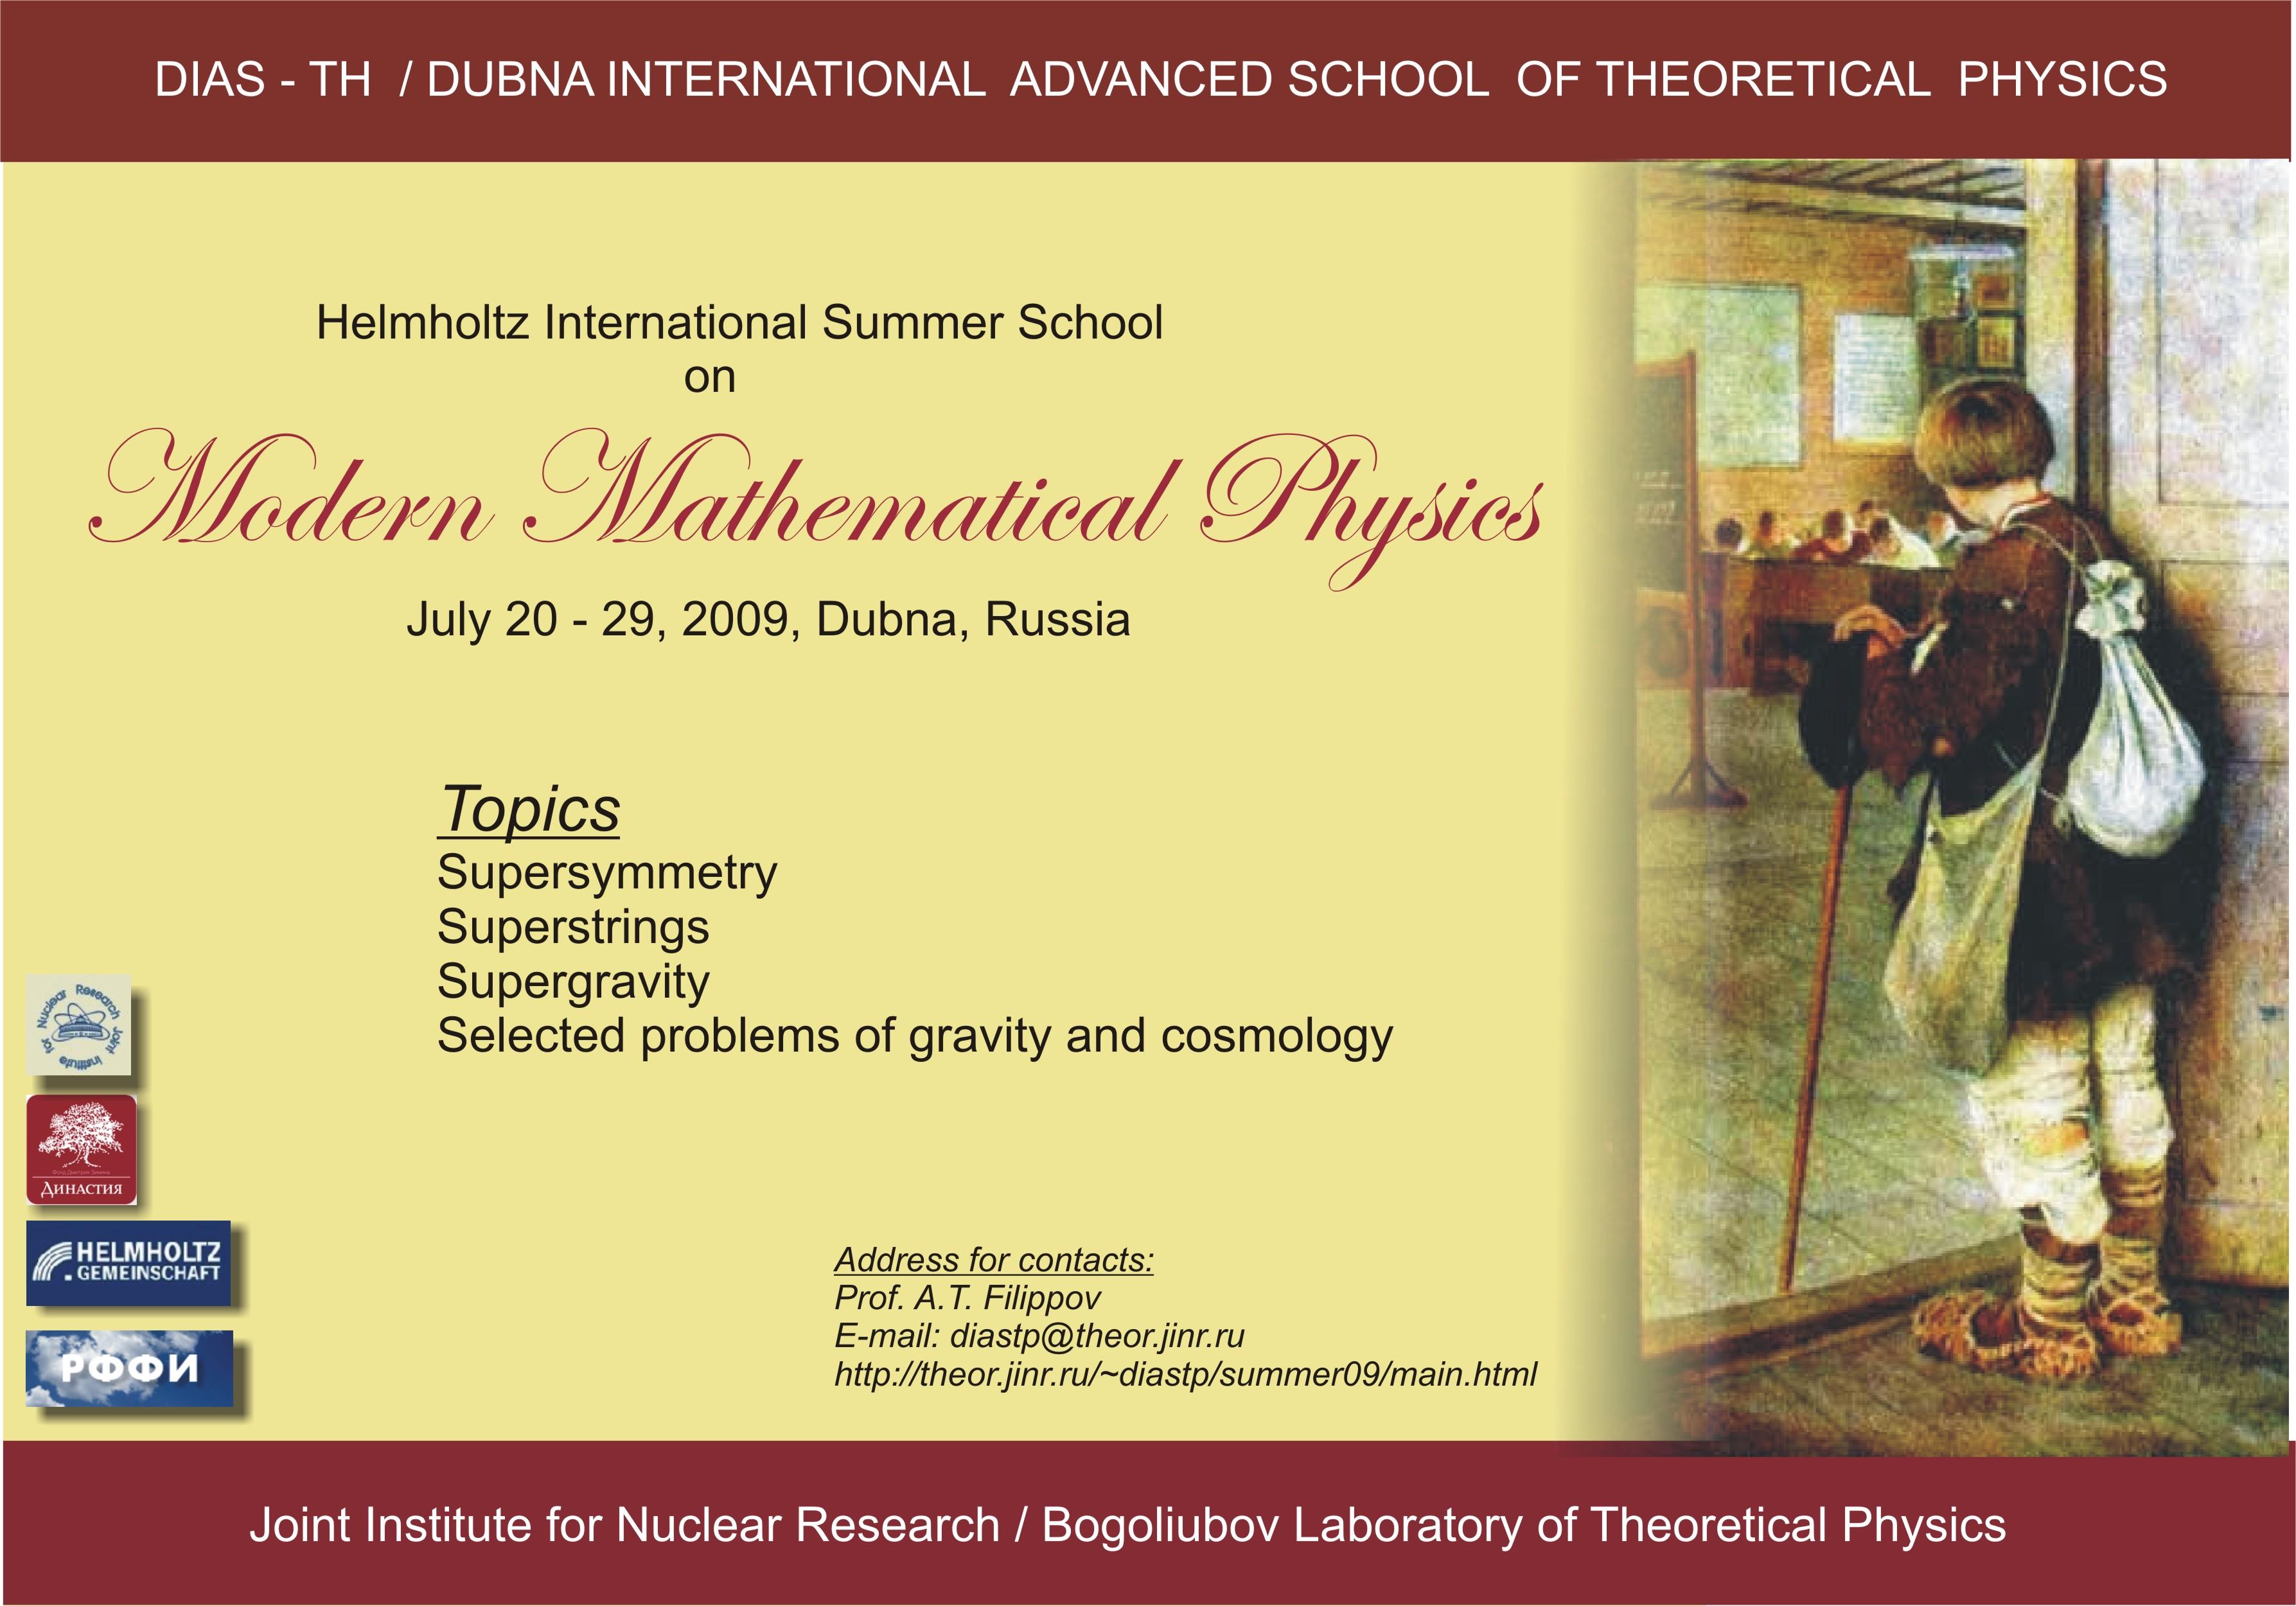 Helmholtz International Summer Schools on Modern